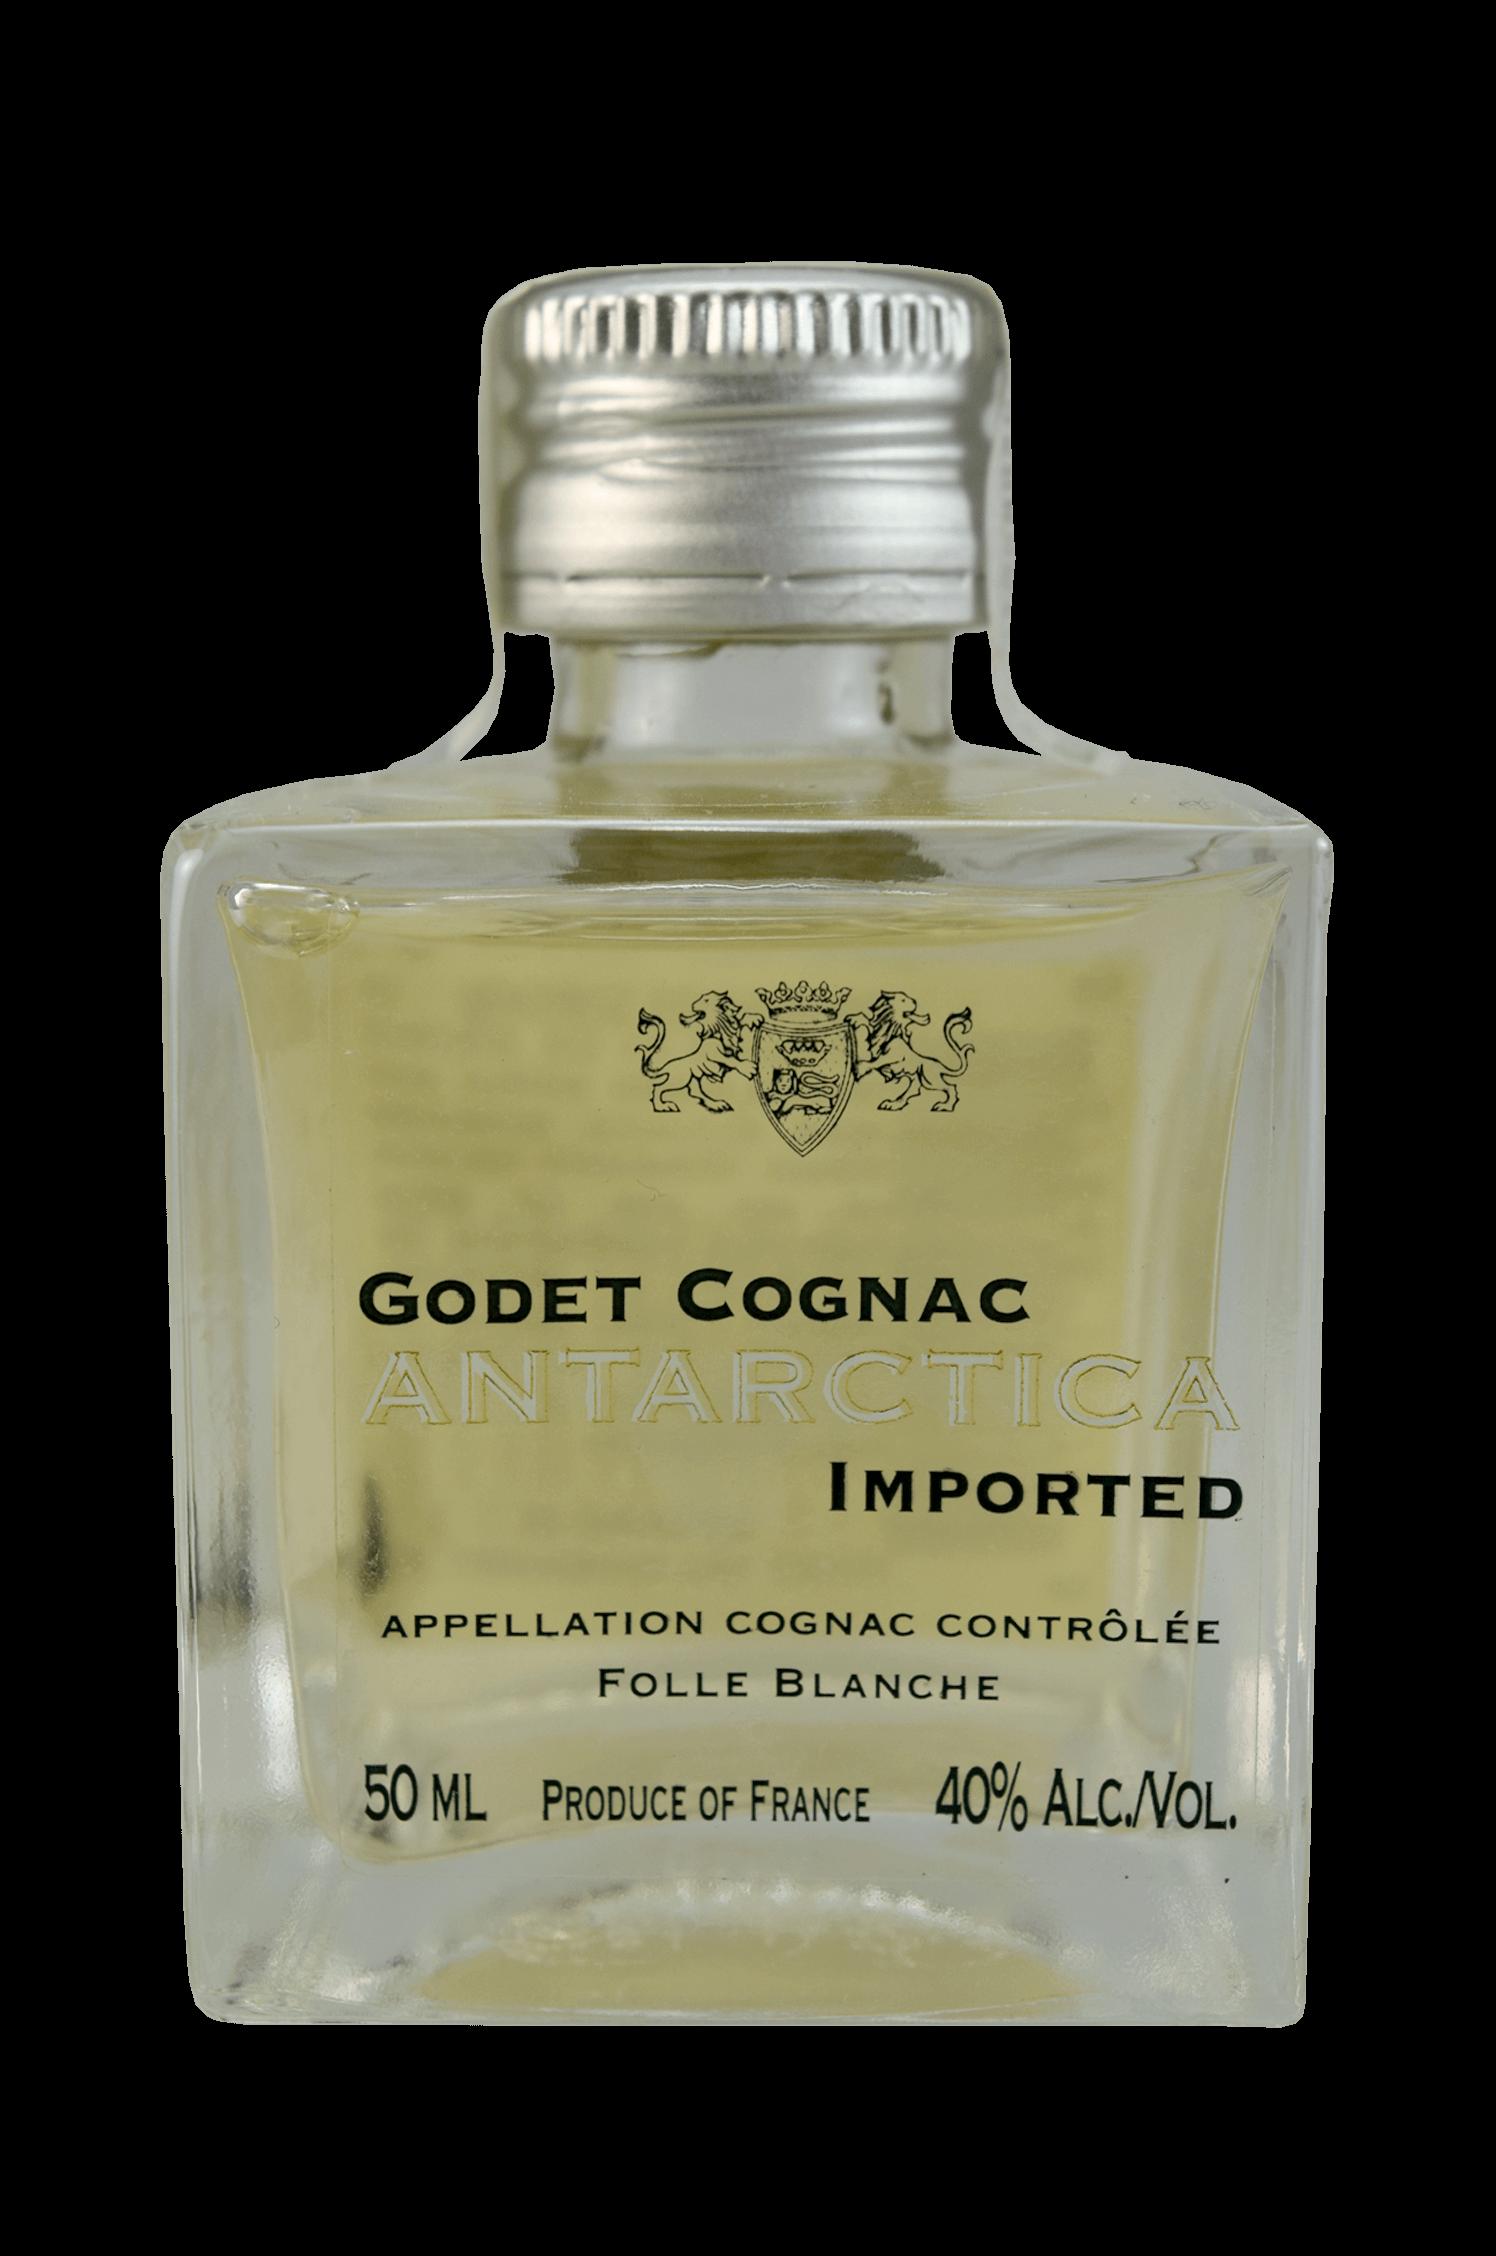 Antarctica Godet Cognac